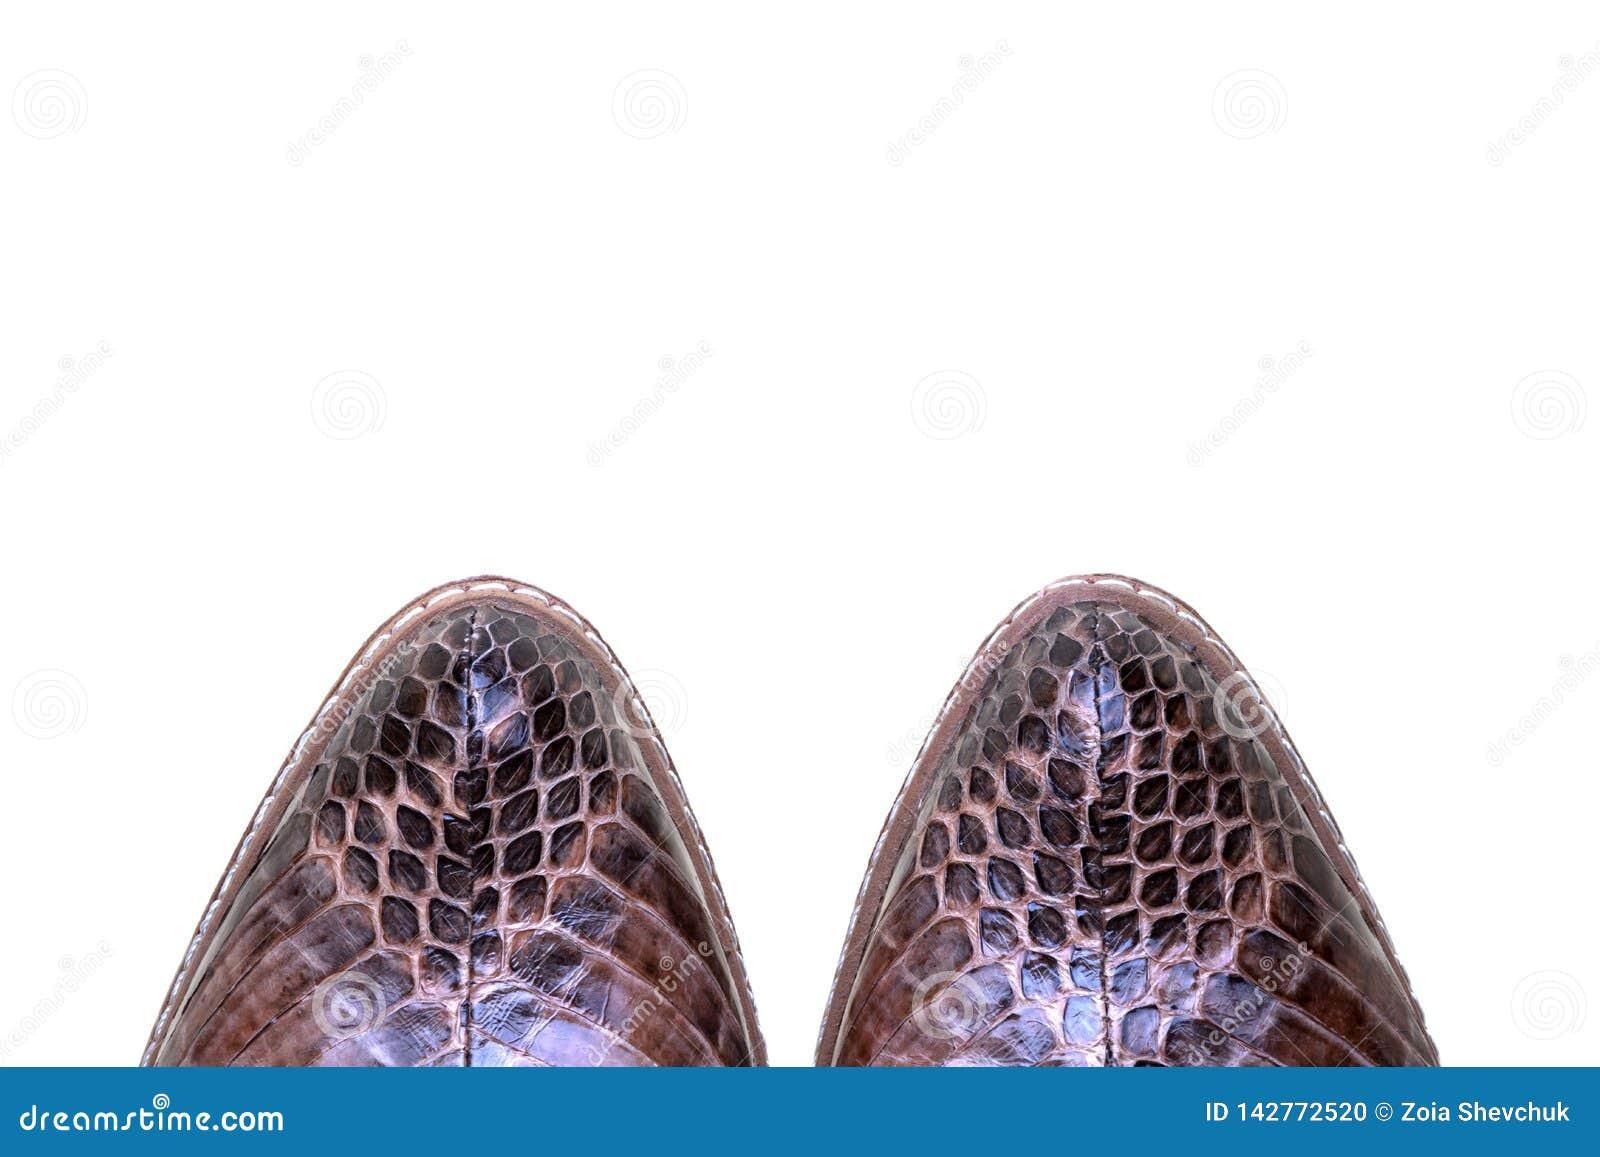 Luxusfrauenschuhe Echtes Schlangenleder Modegegenstand